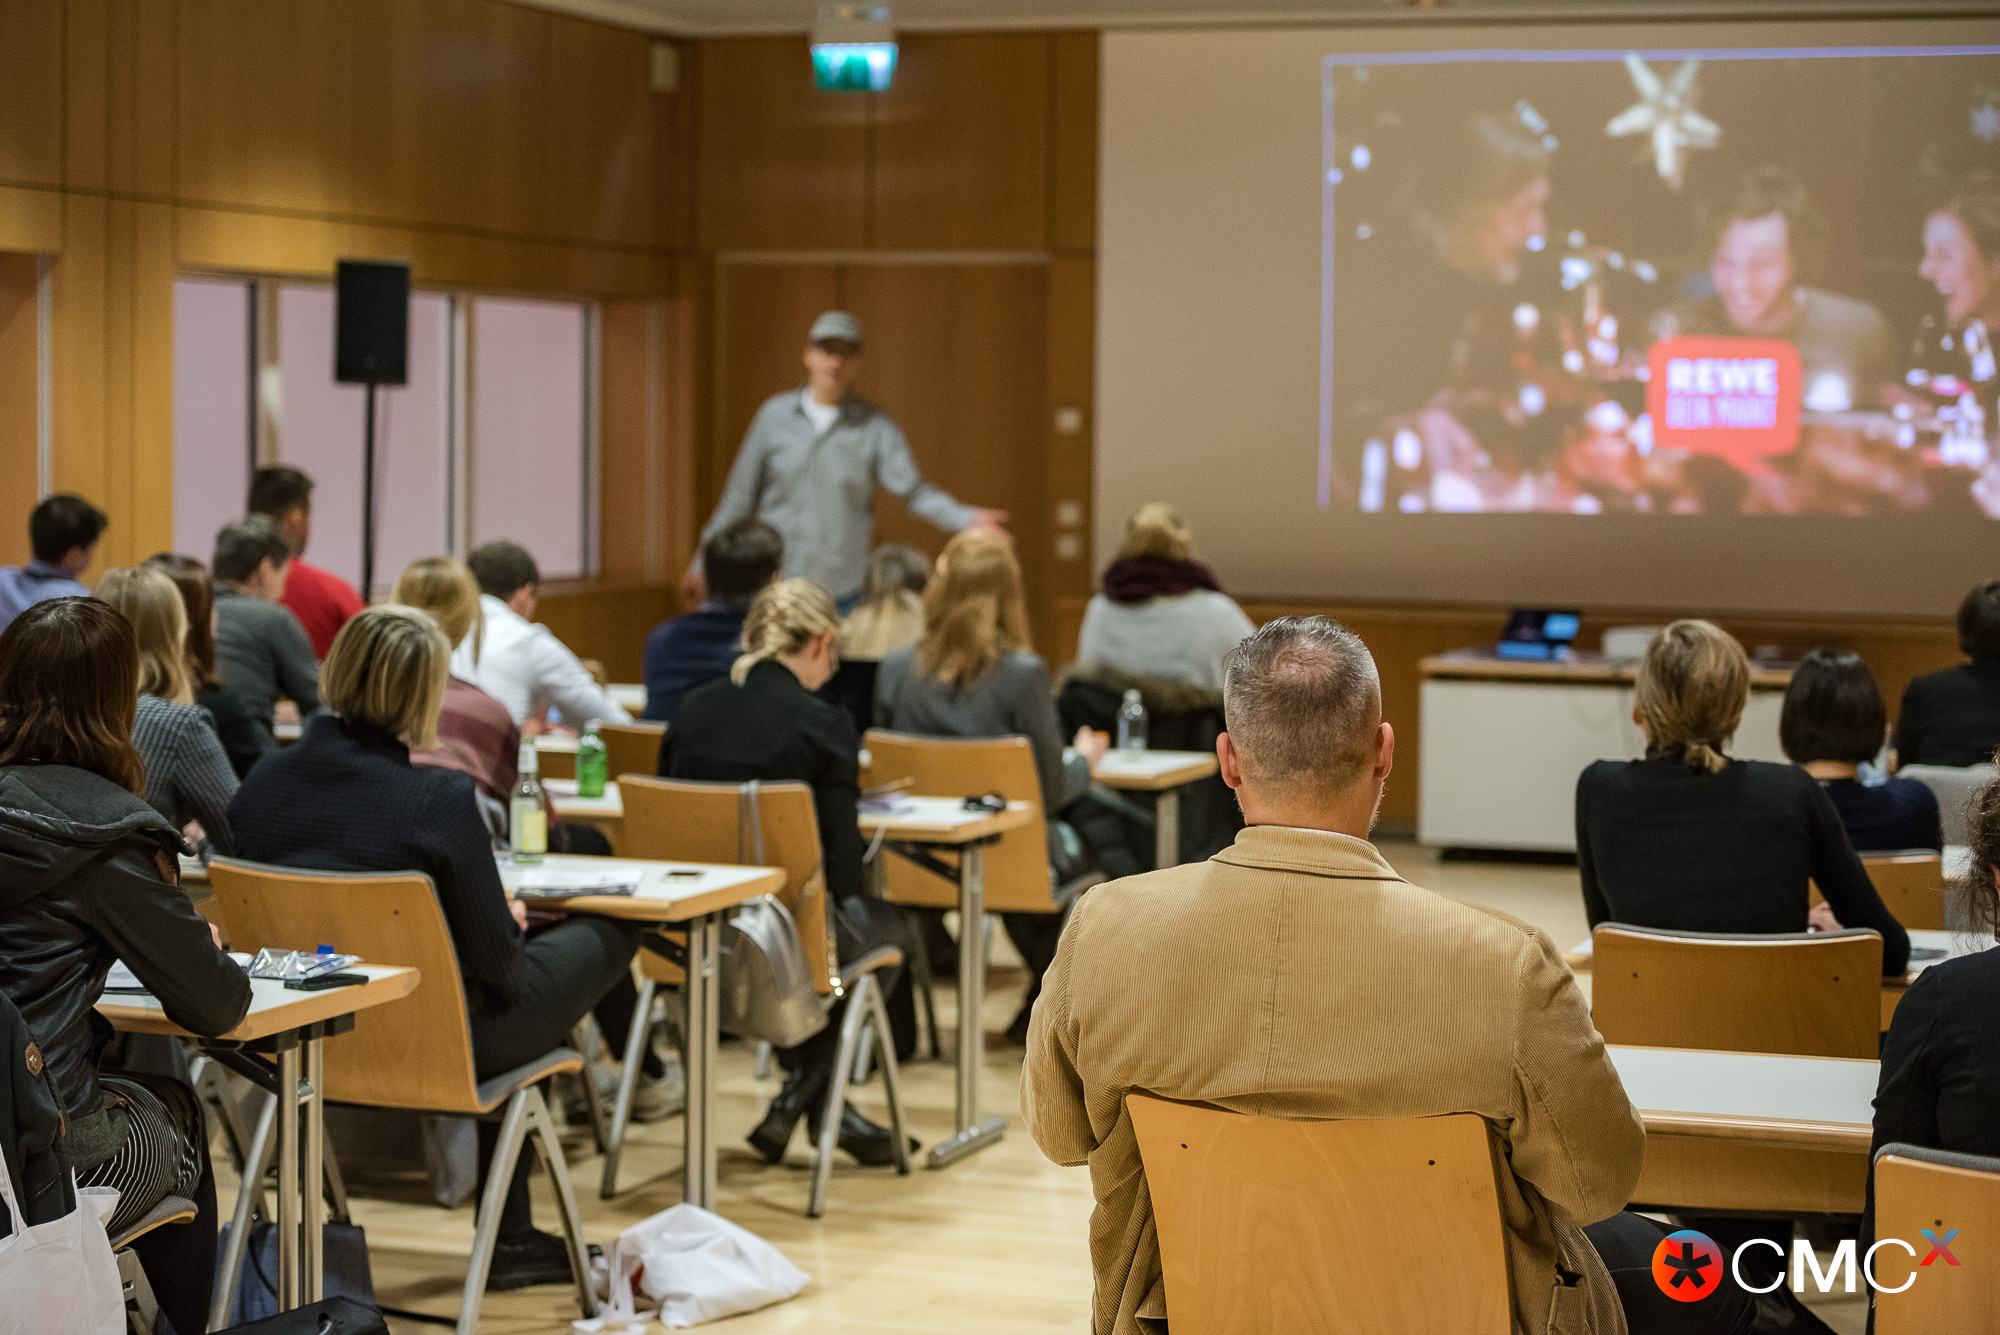 Content-Marketing Workshop